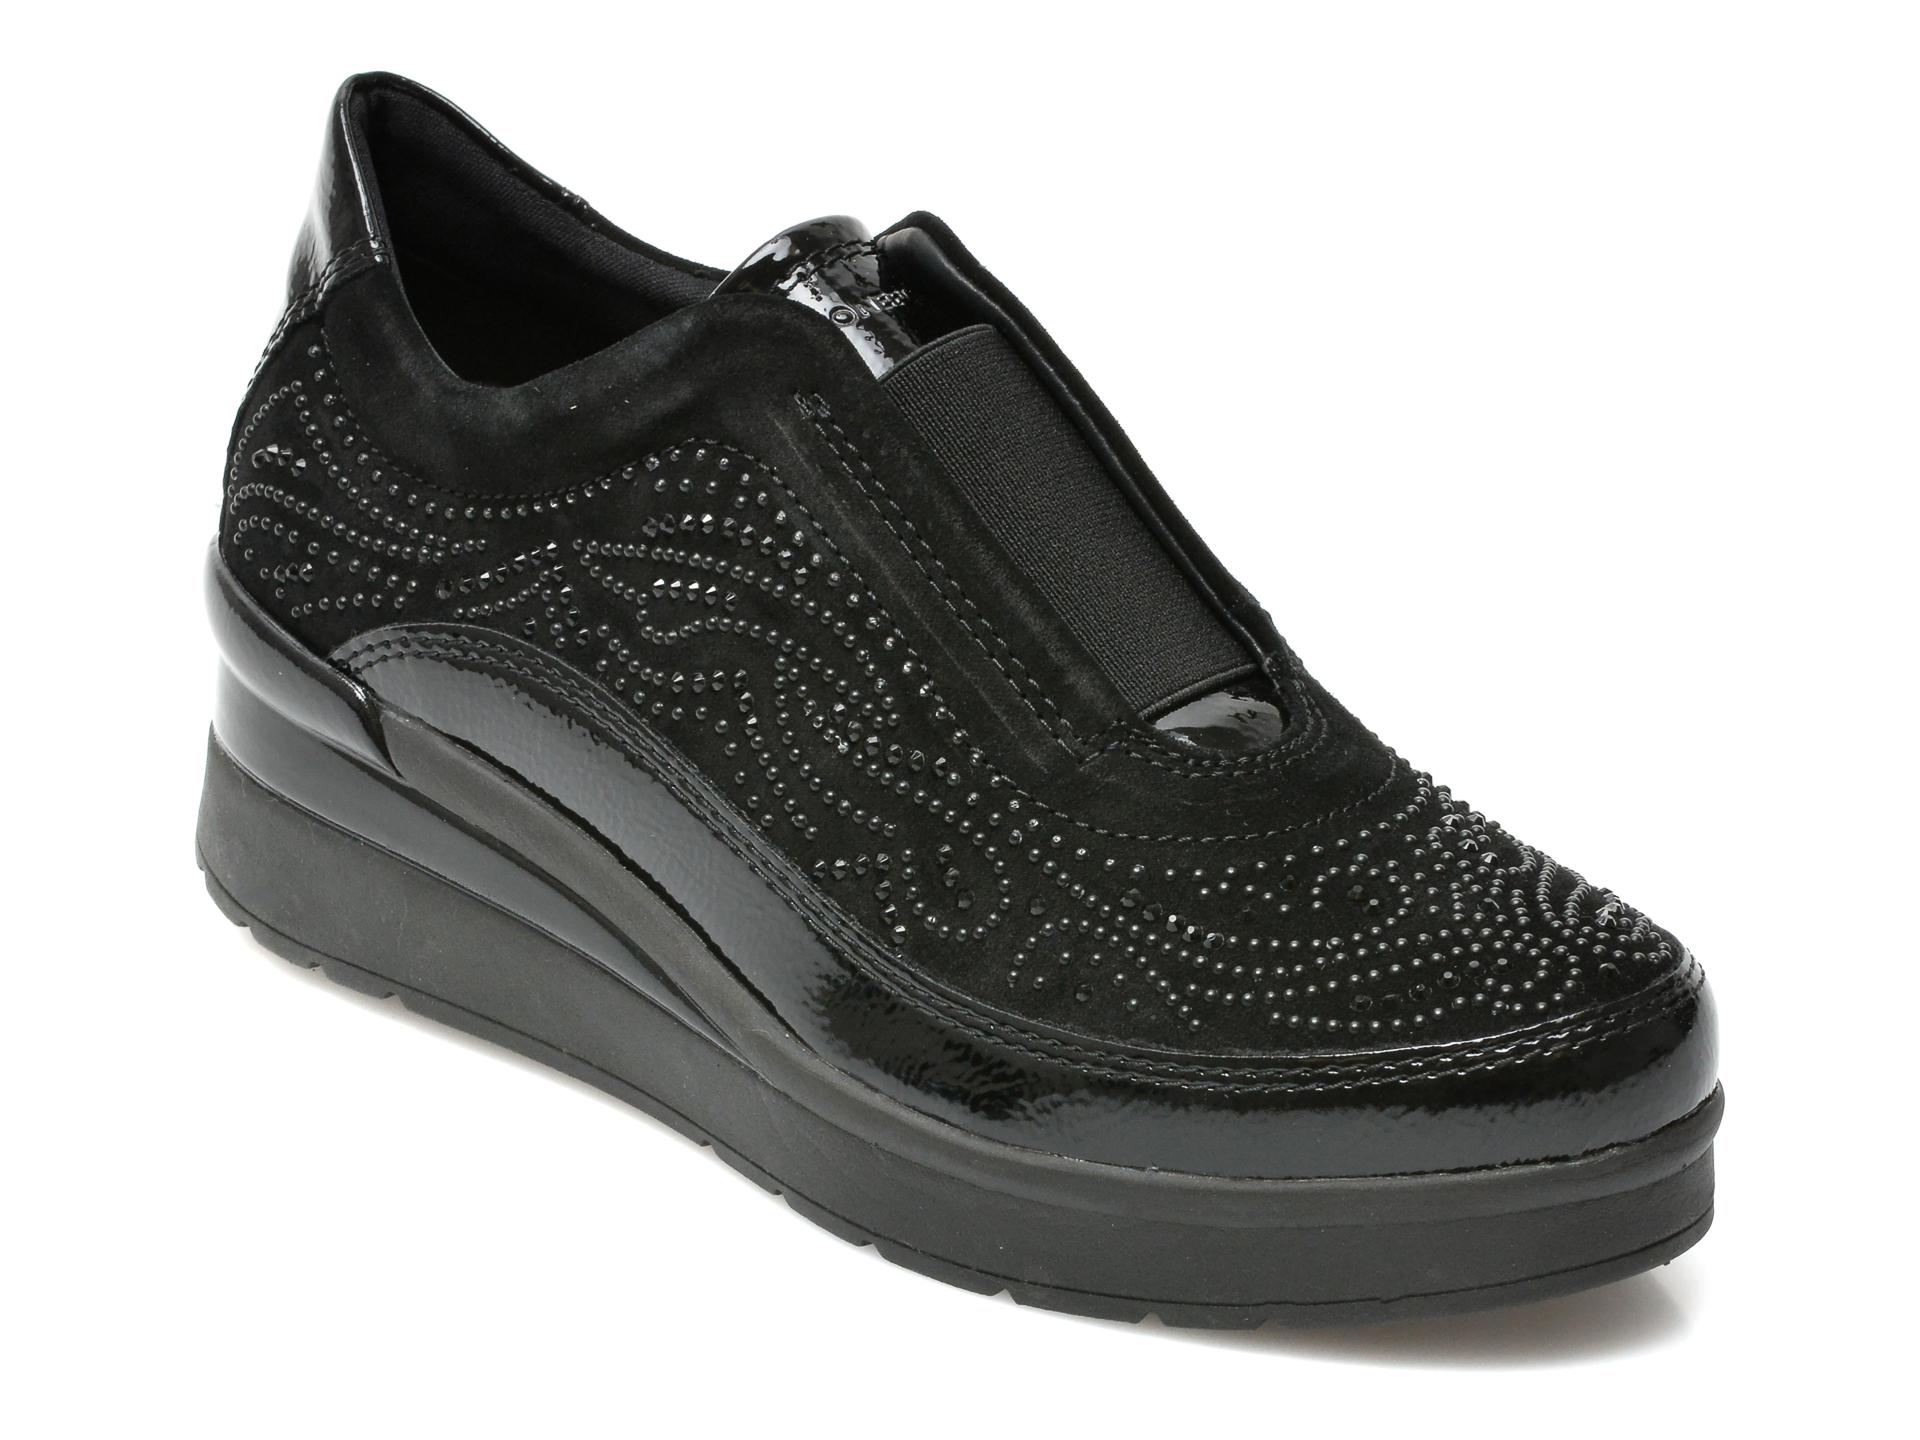 Pantofi STONEFLY negri, CREAM17, din piele naturala